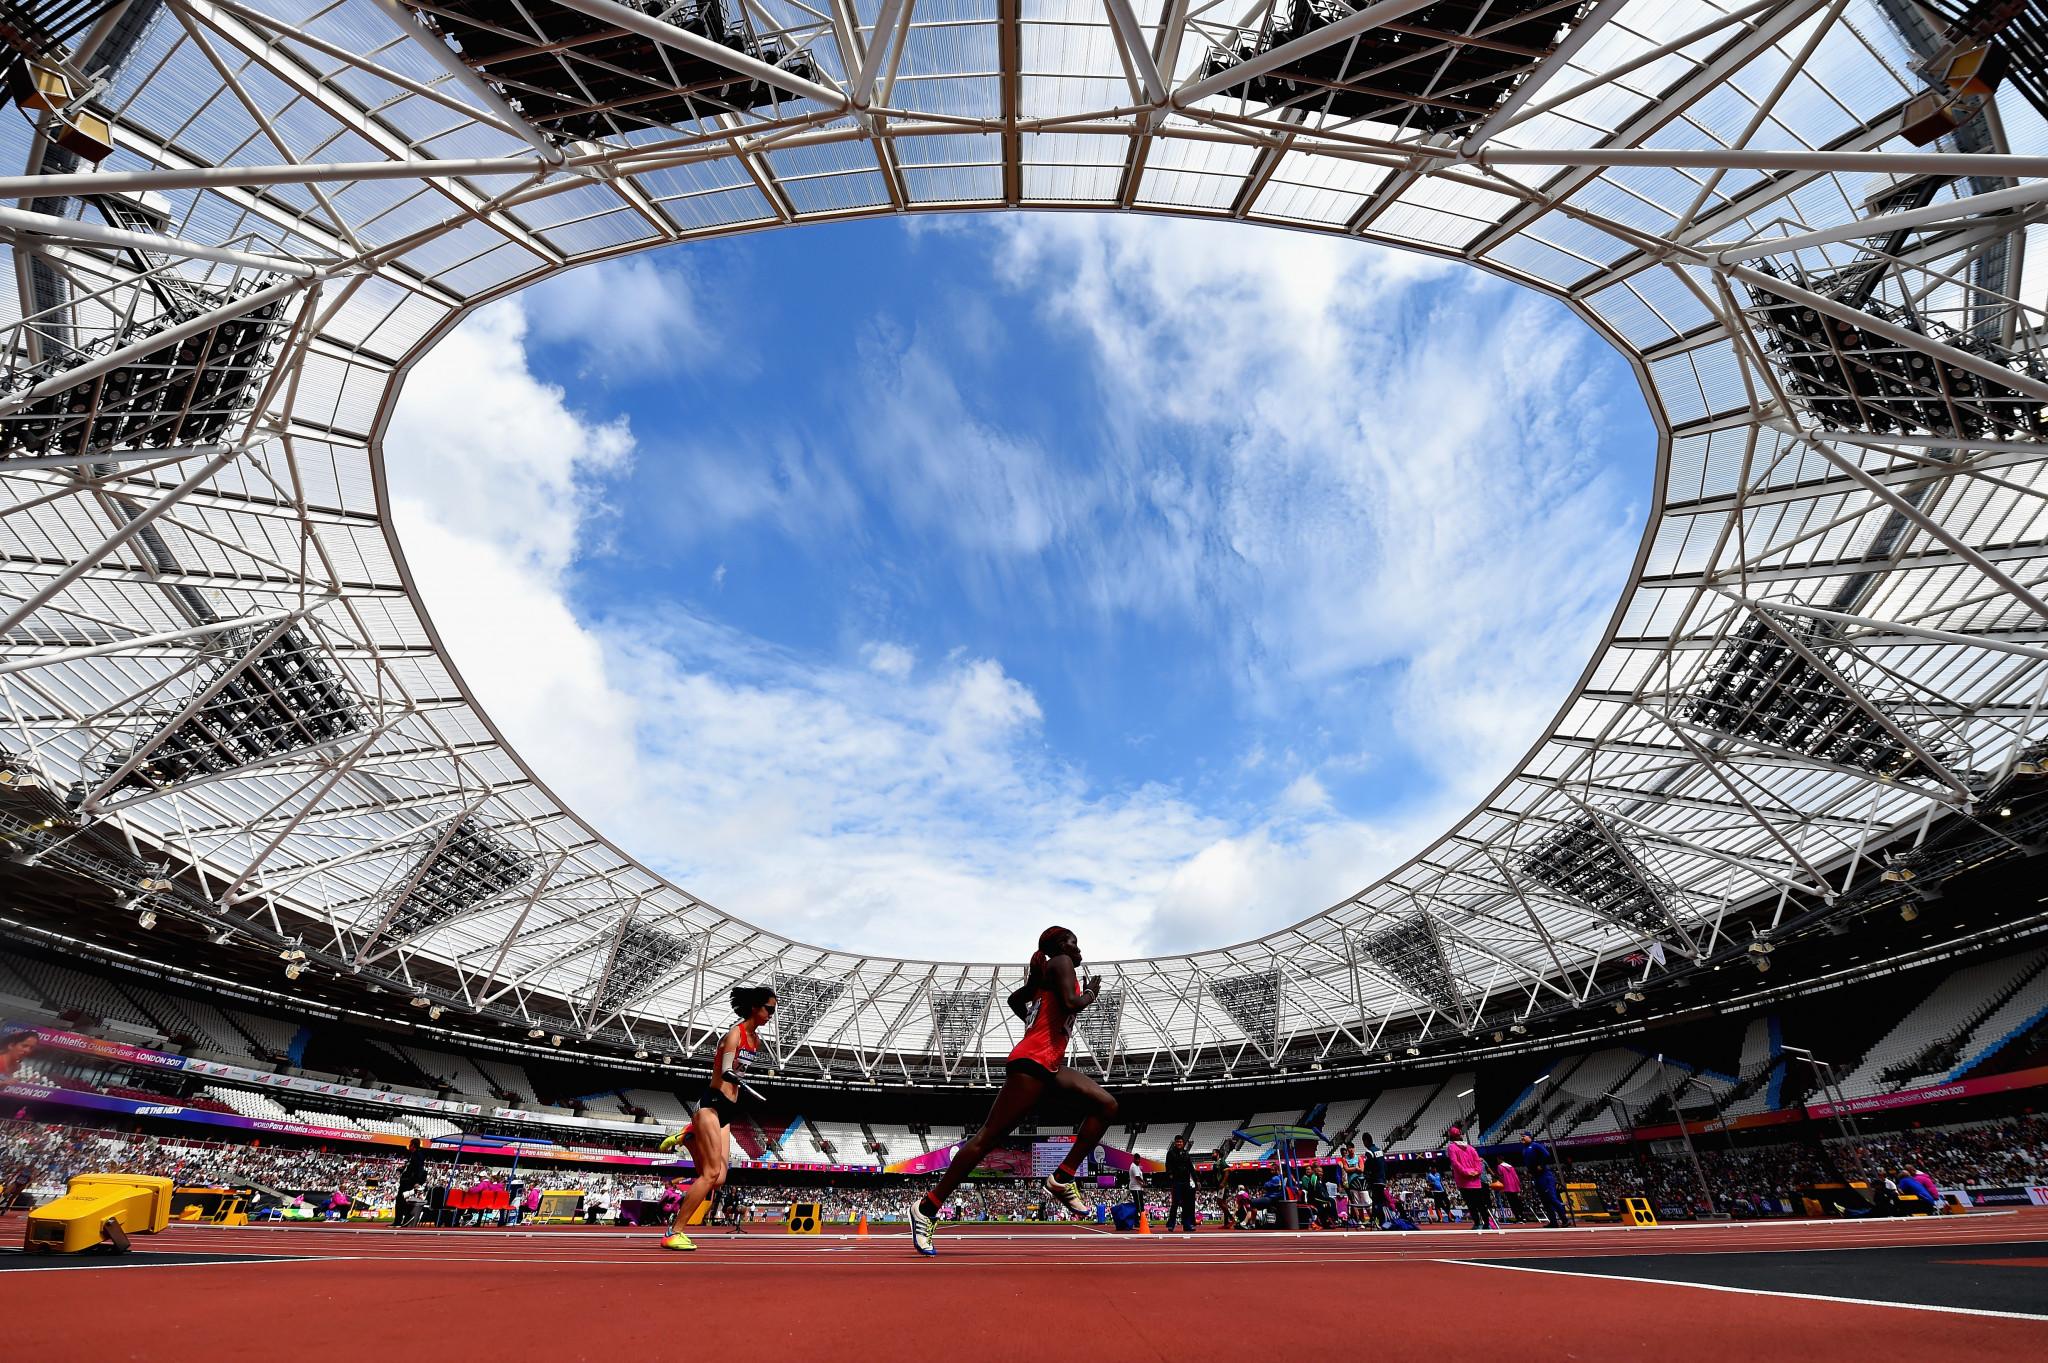 World Para Athletics announces classification changes for 2018 season